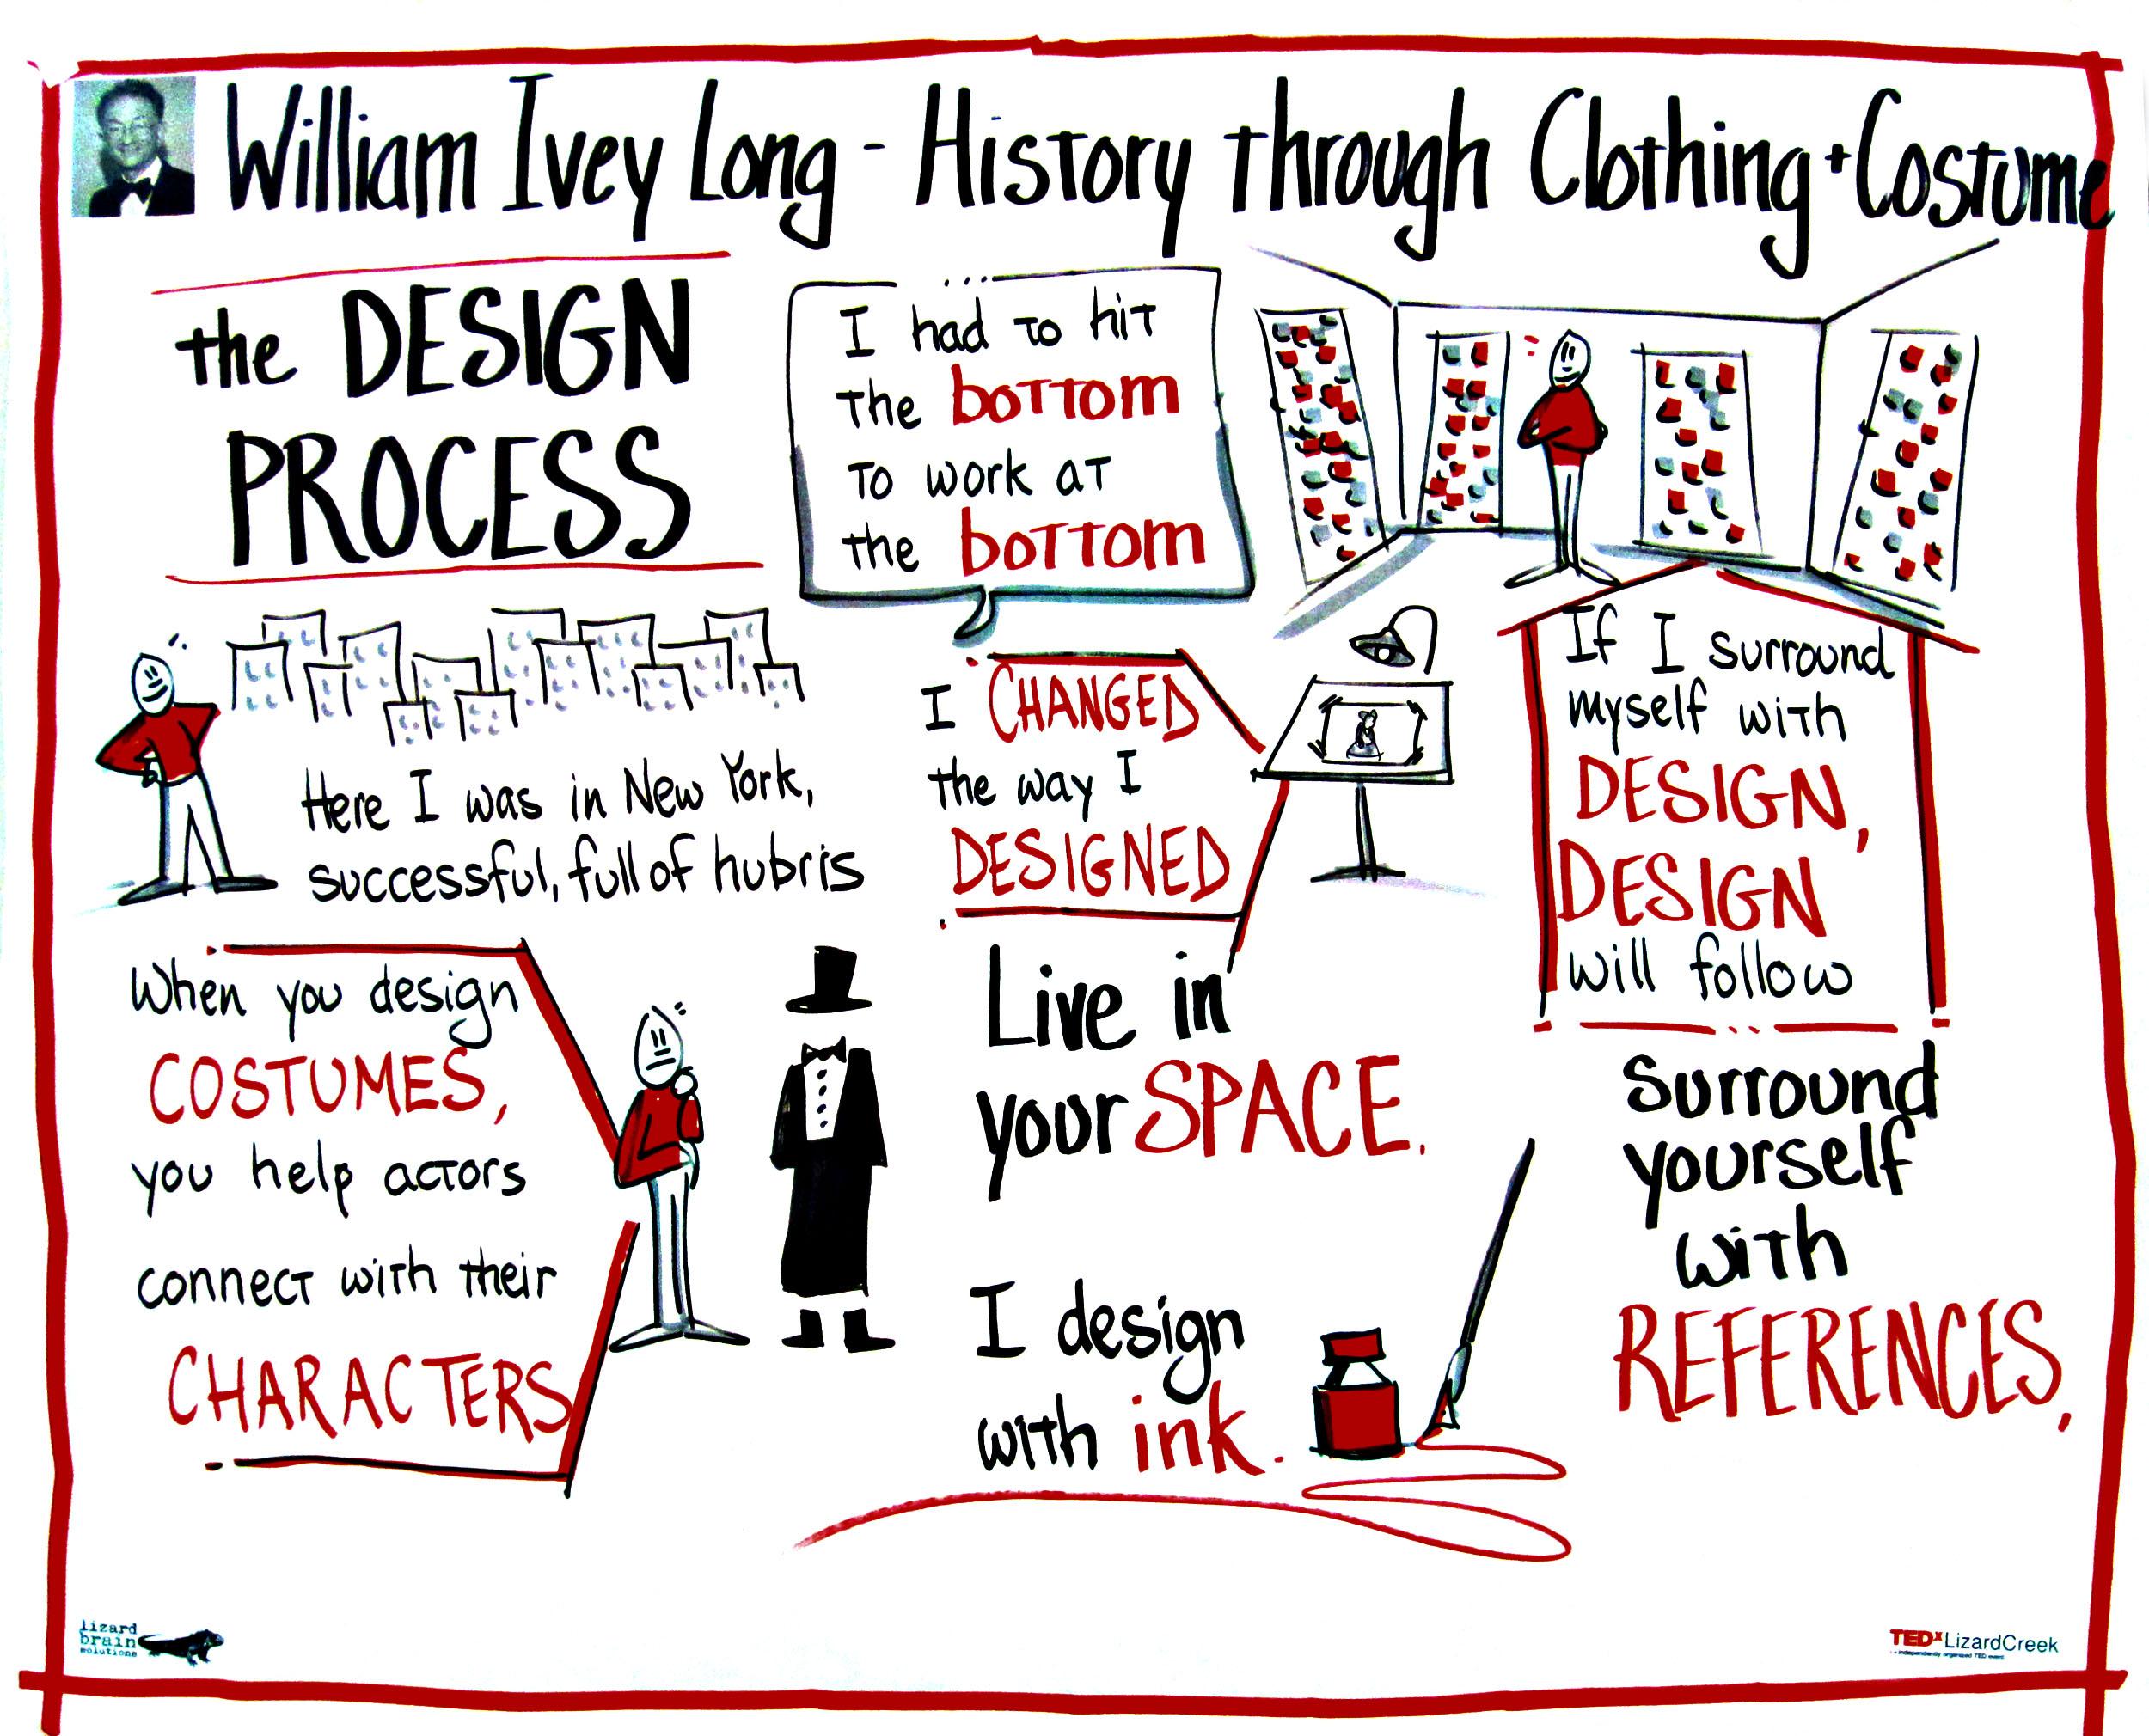 William Ivey Long.jpg